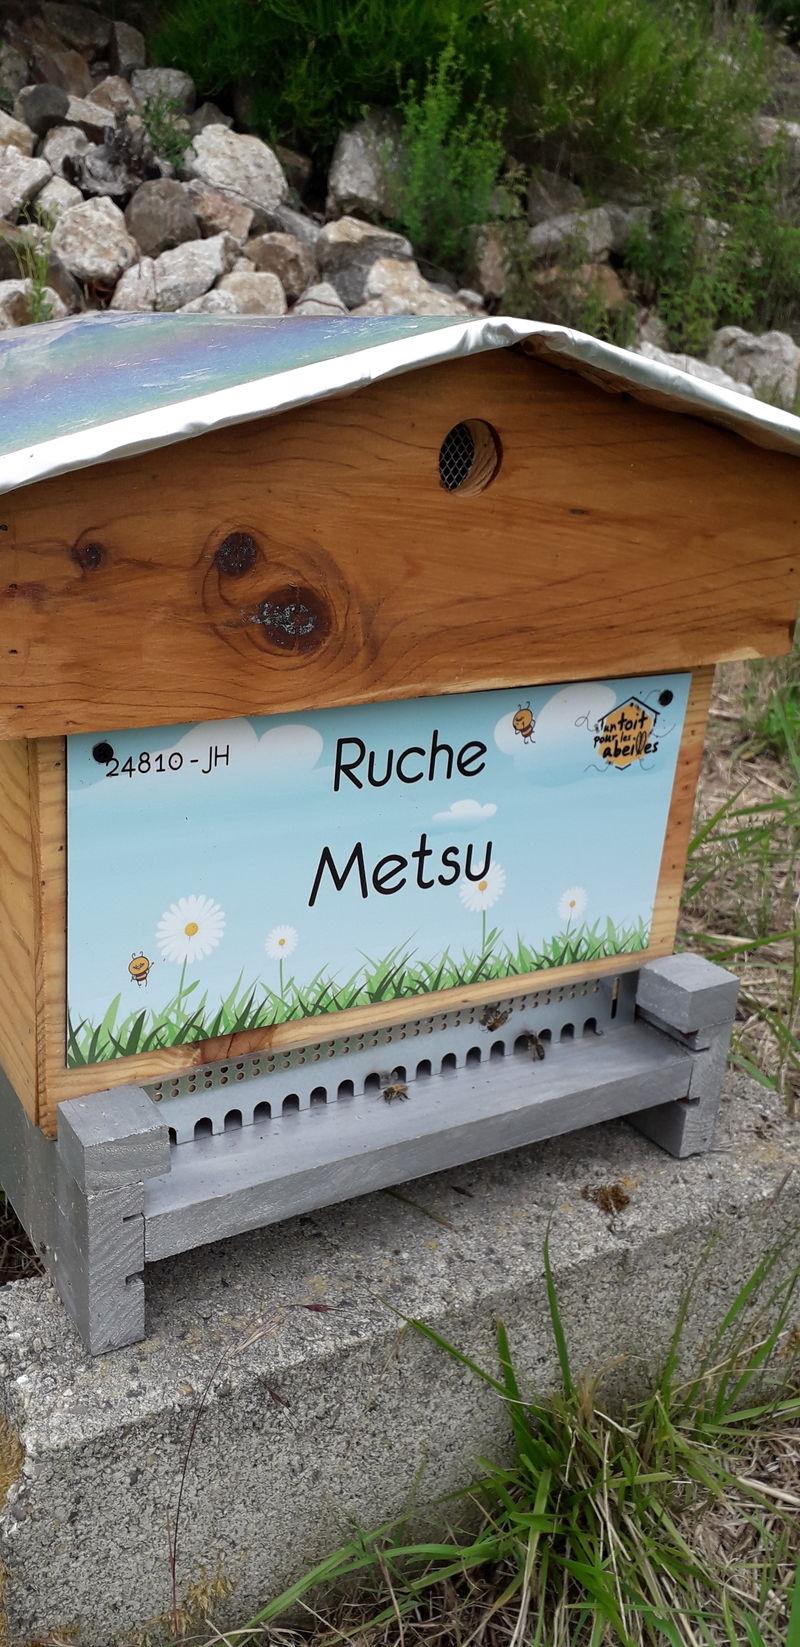 La ruche Metsu